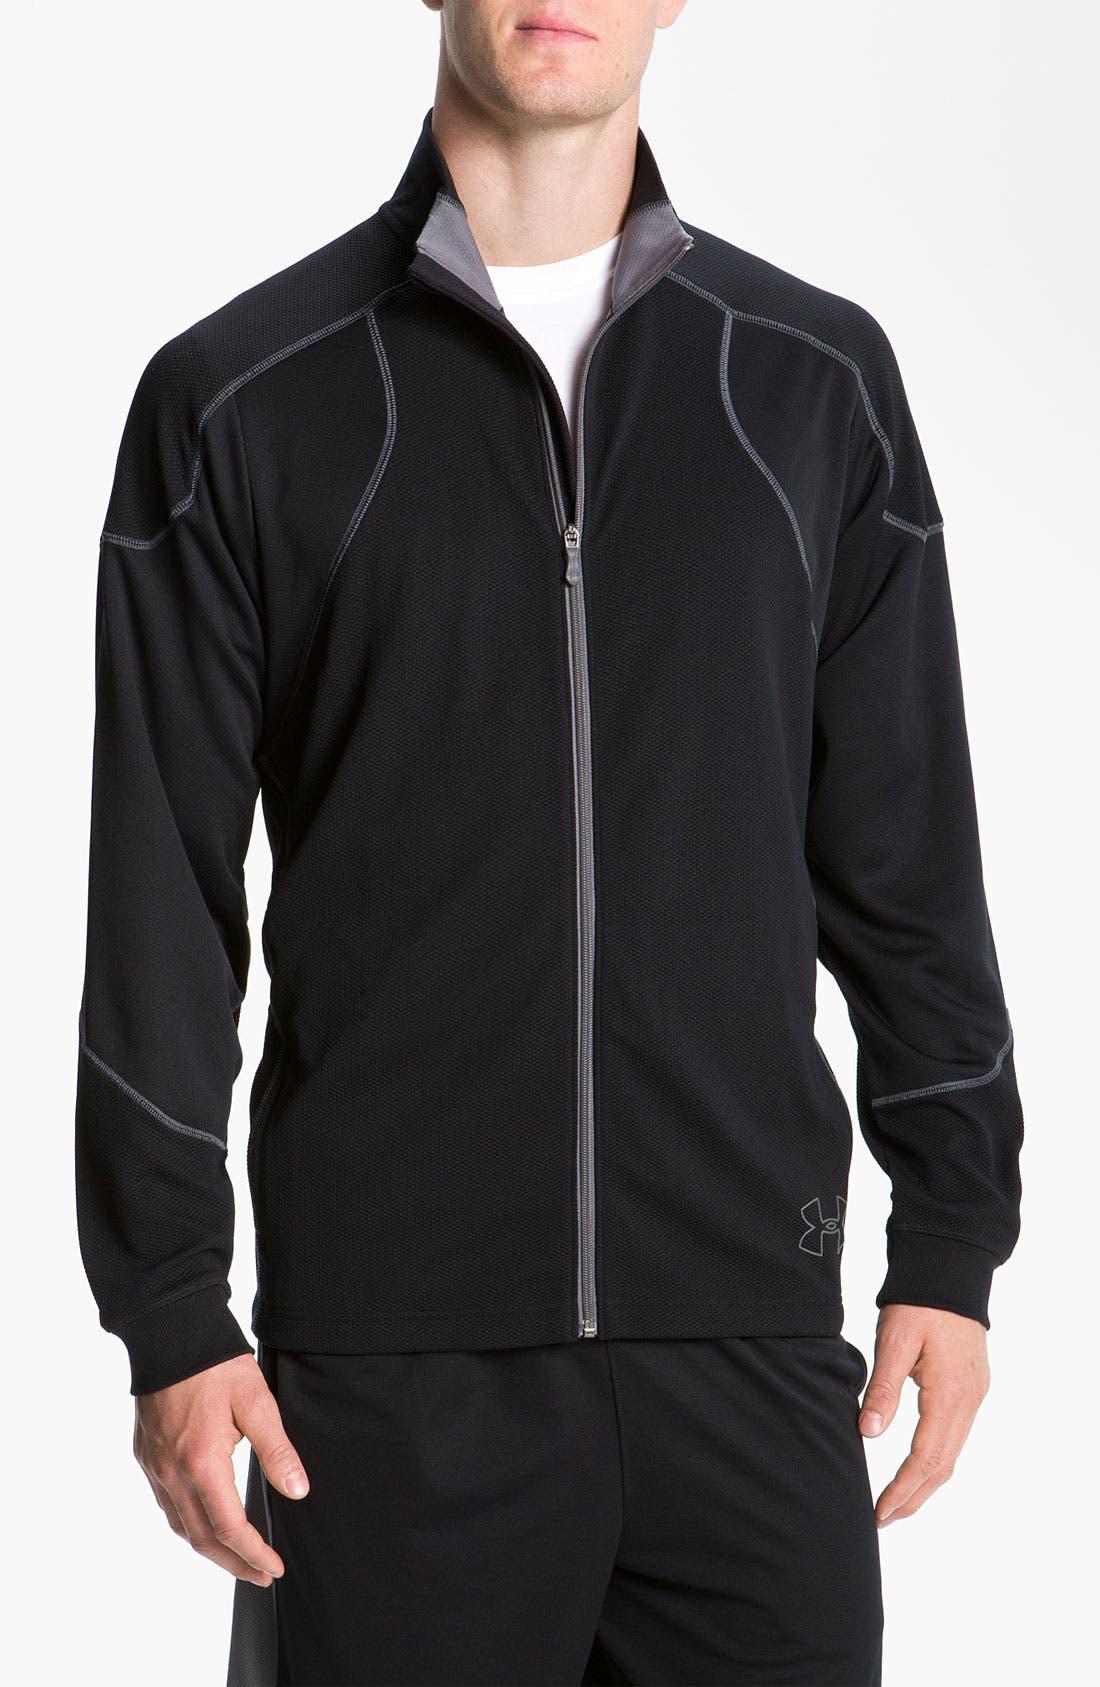 Main Image - Under Armour 'Advent' HeatGear® Jacket